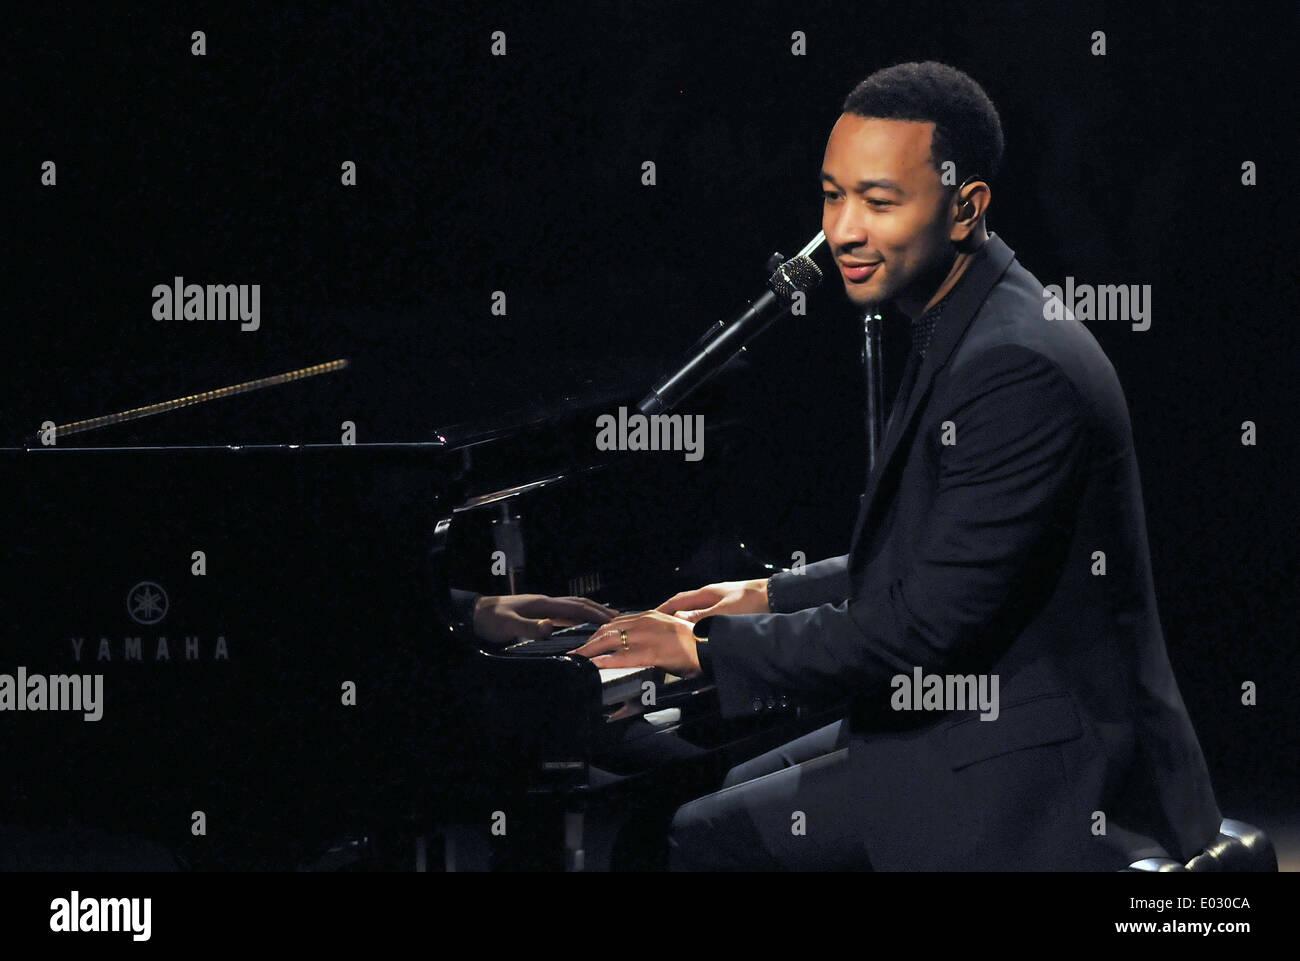 Melbourne, Florida, USA. 28th April 2014. Singer-songwriter John Legend, a nine time Grammy Award winner, performs - Stock Image